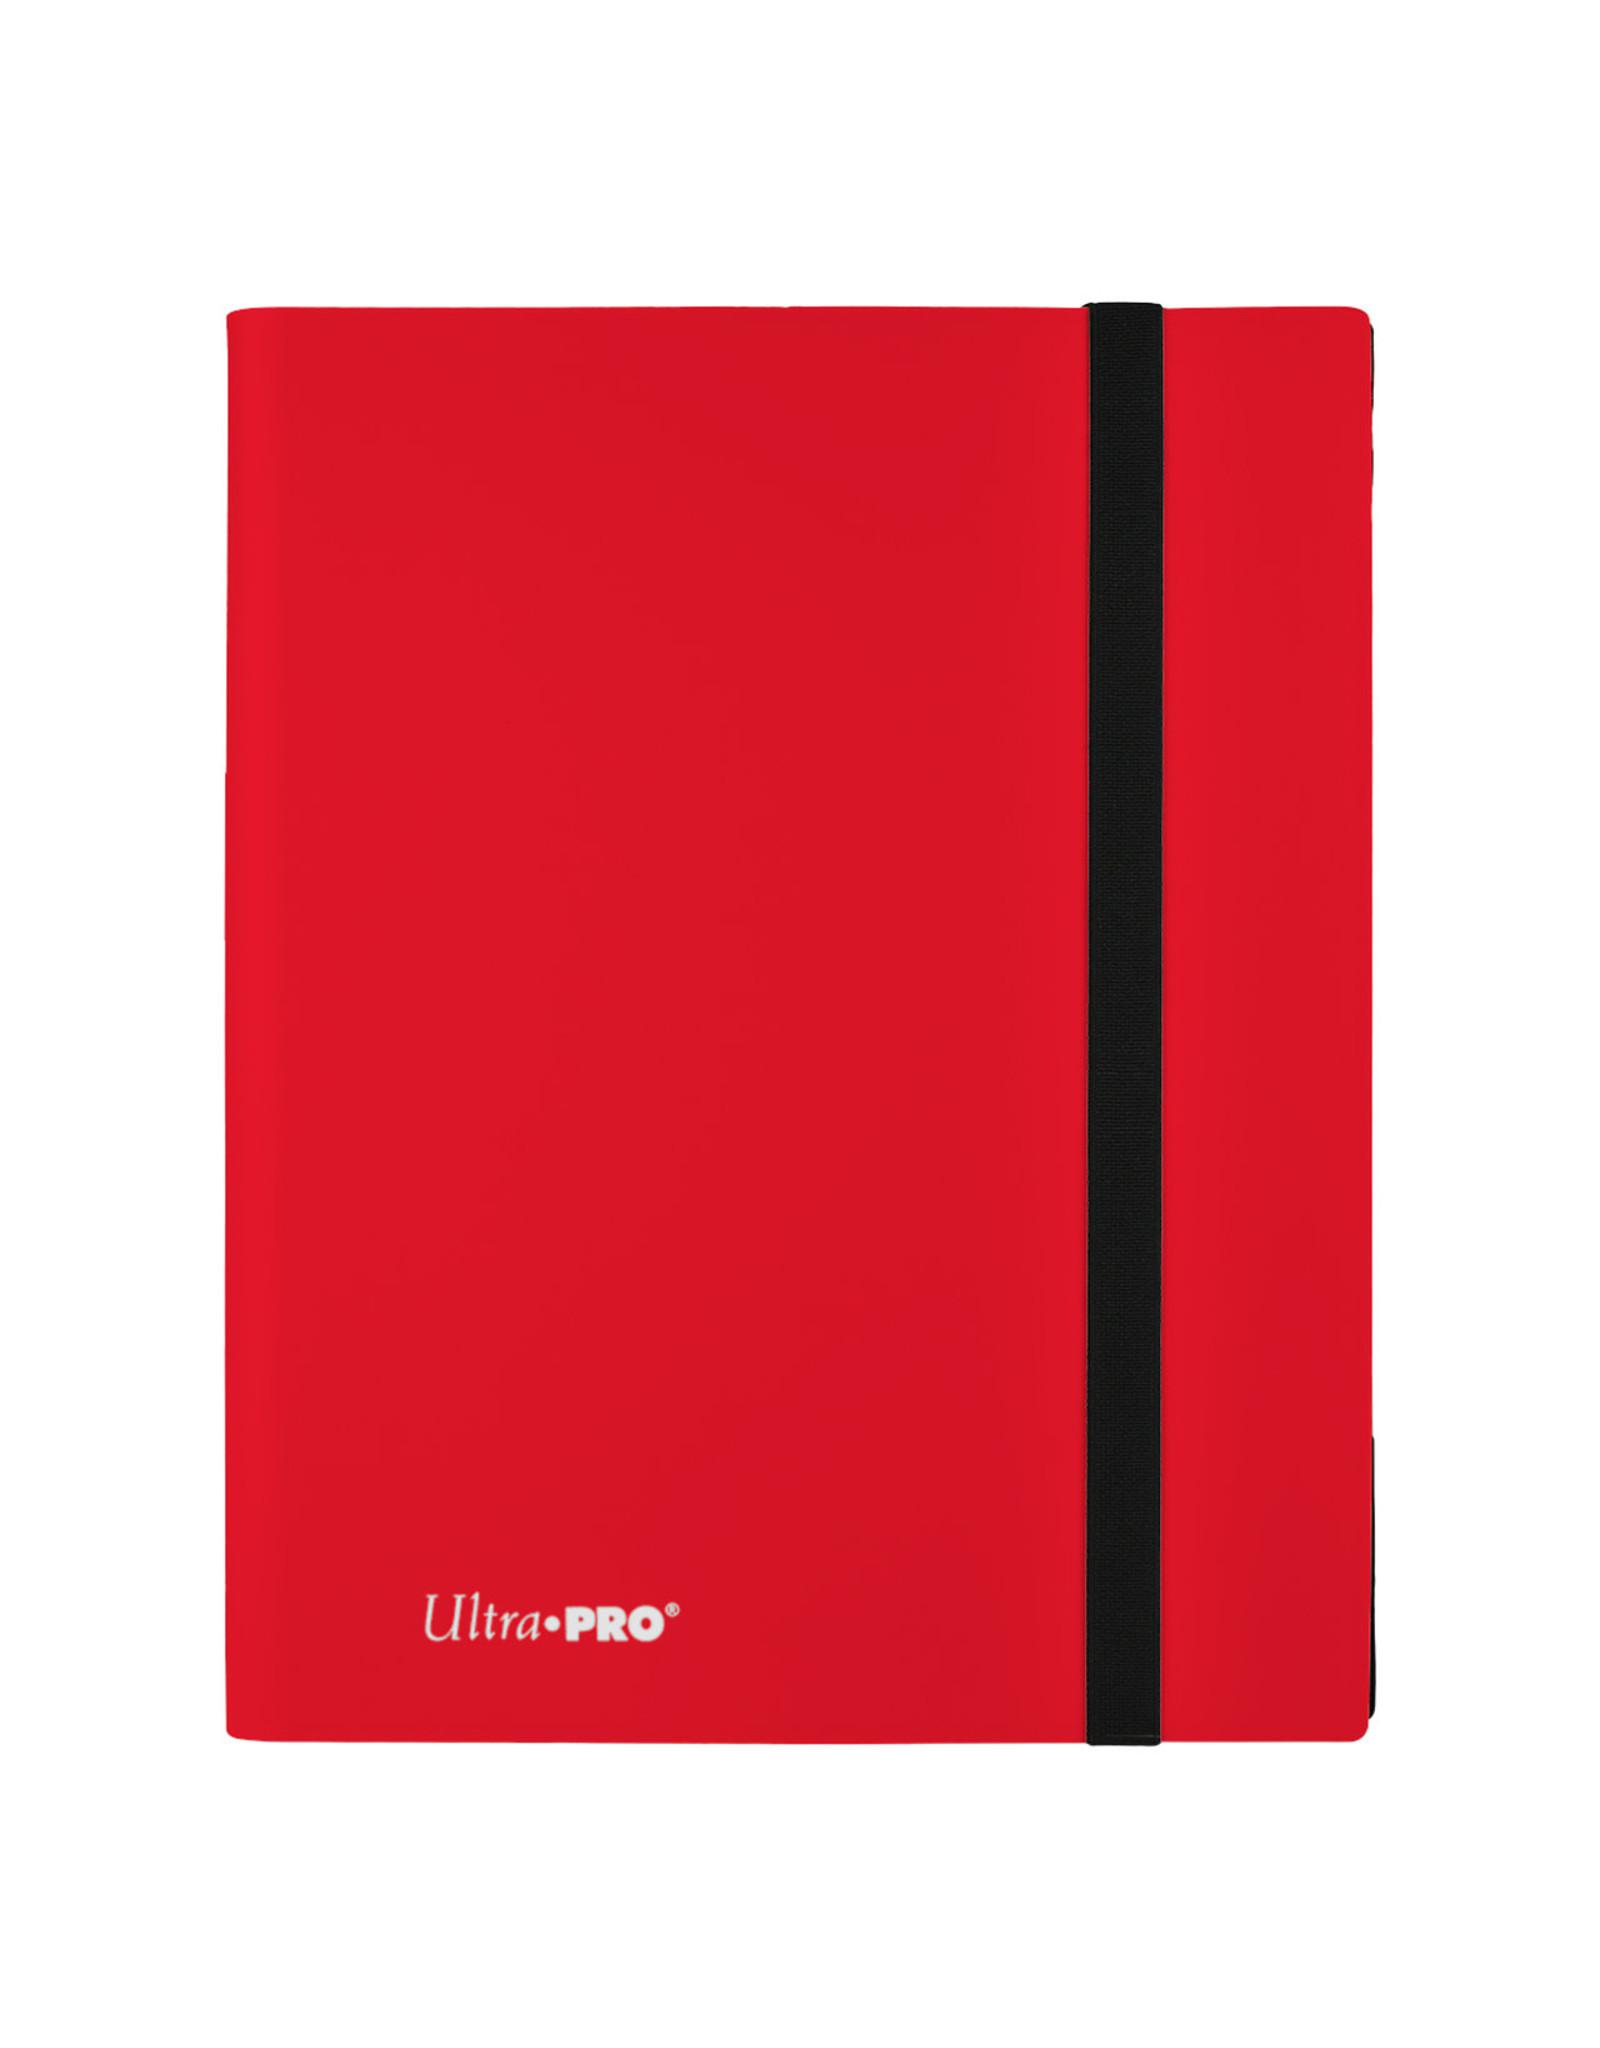 Ultra Pro Binder: PRO 9-Pocket Eclipse- Apple Red